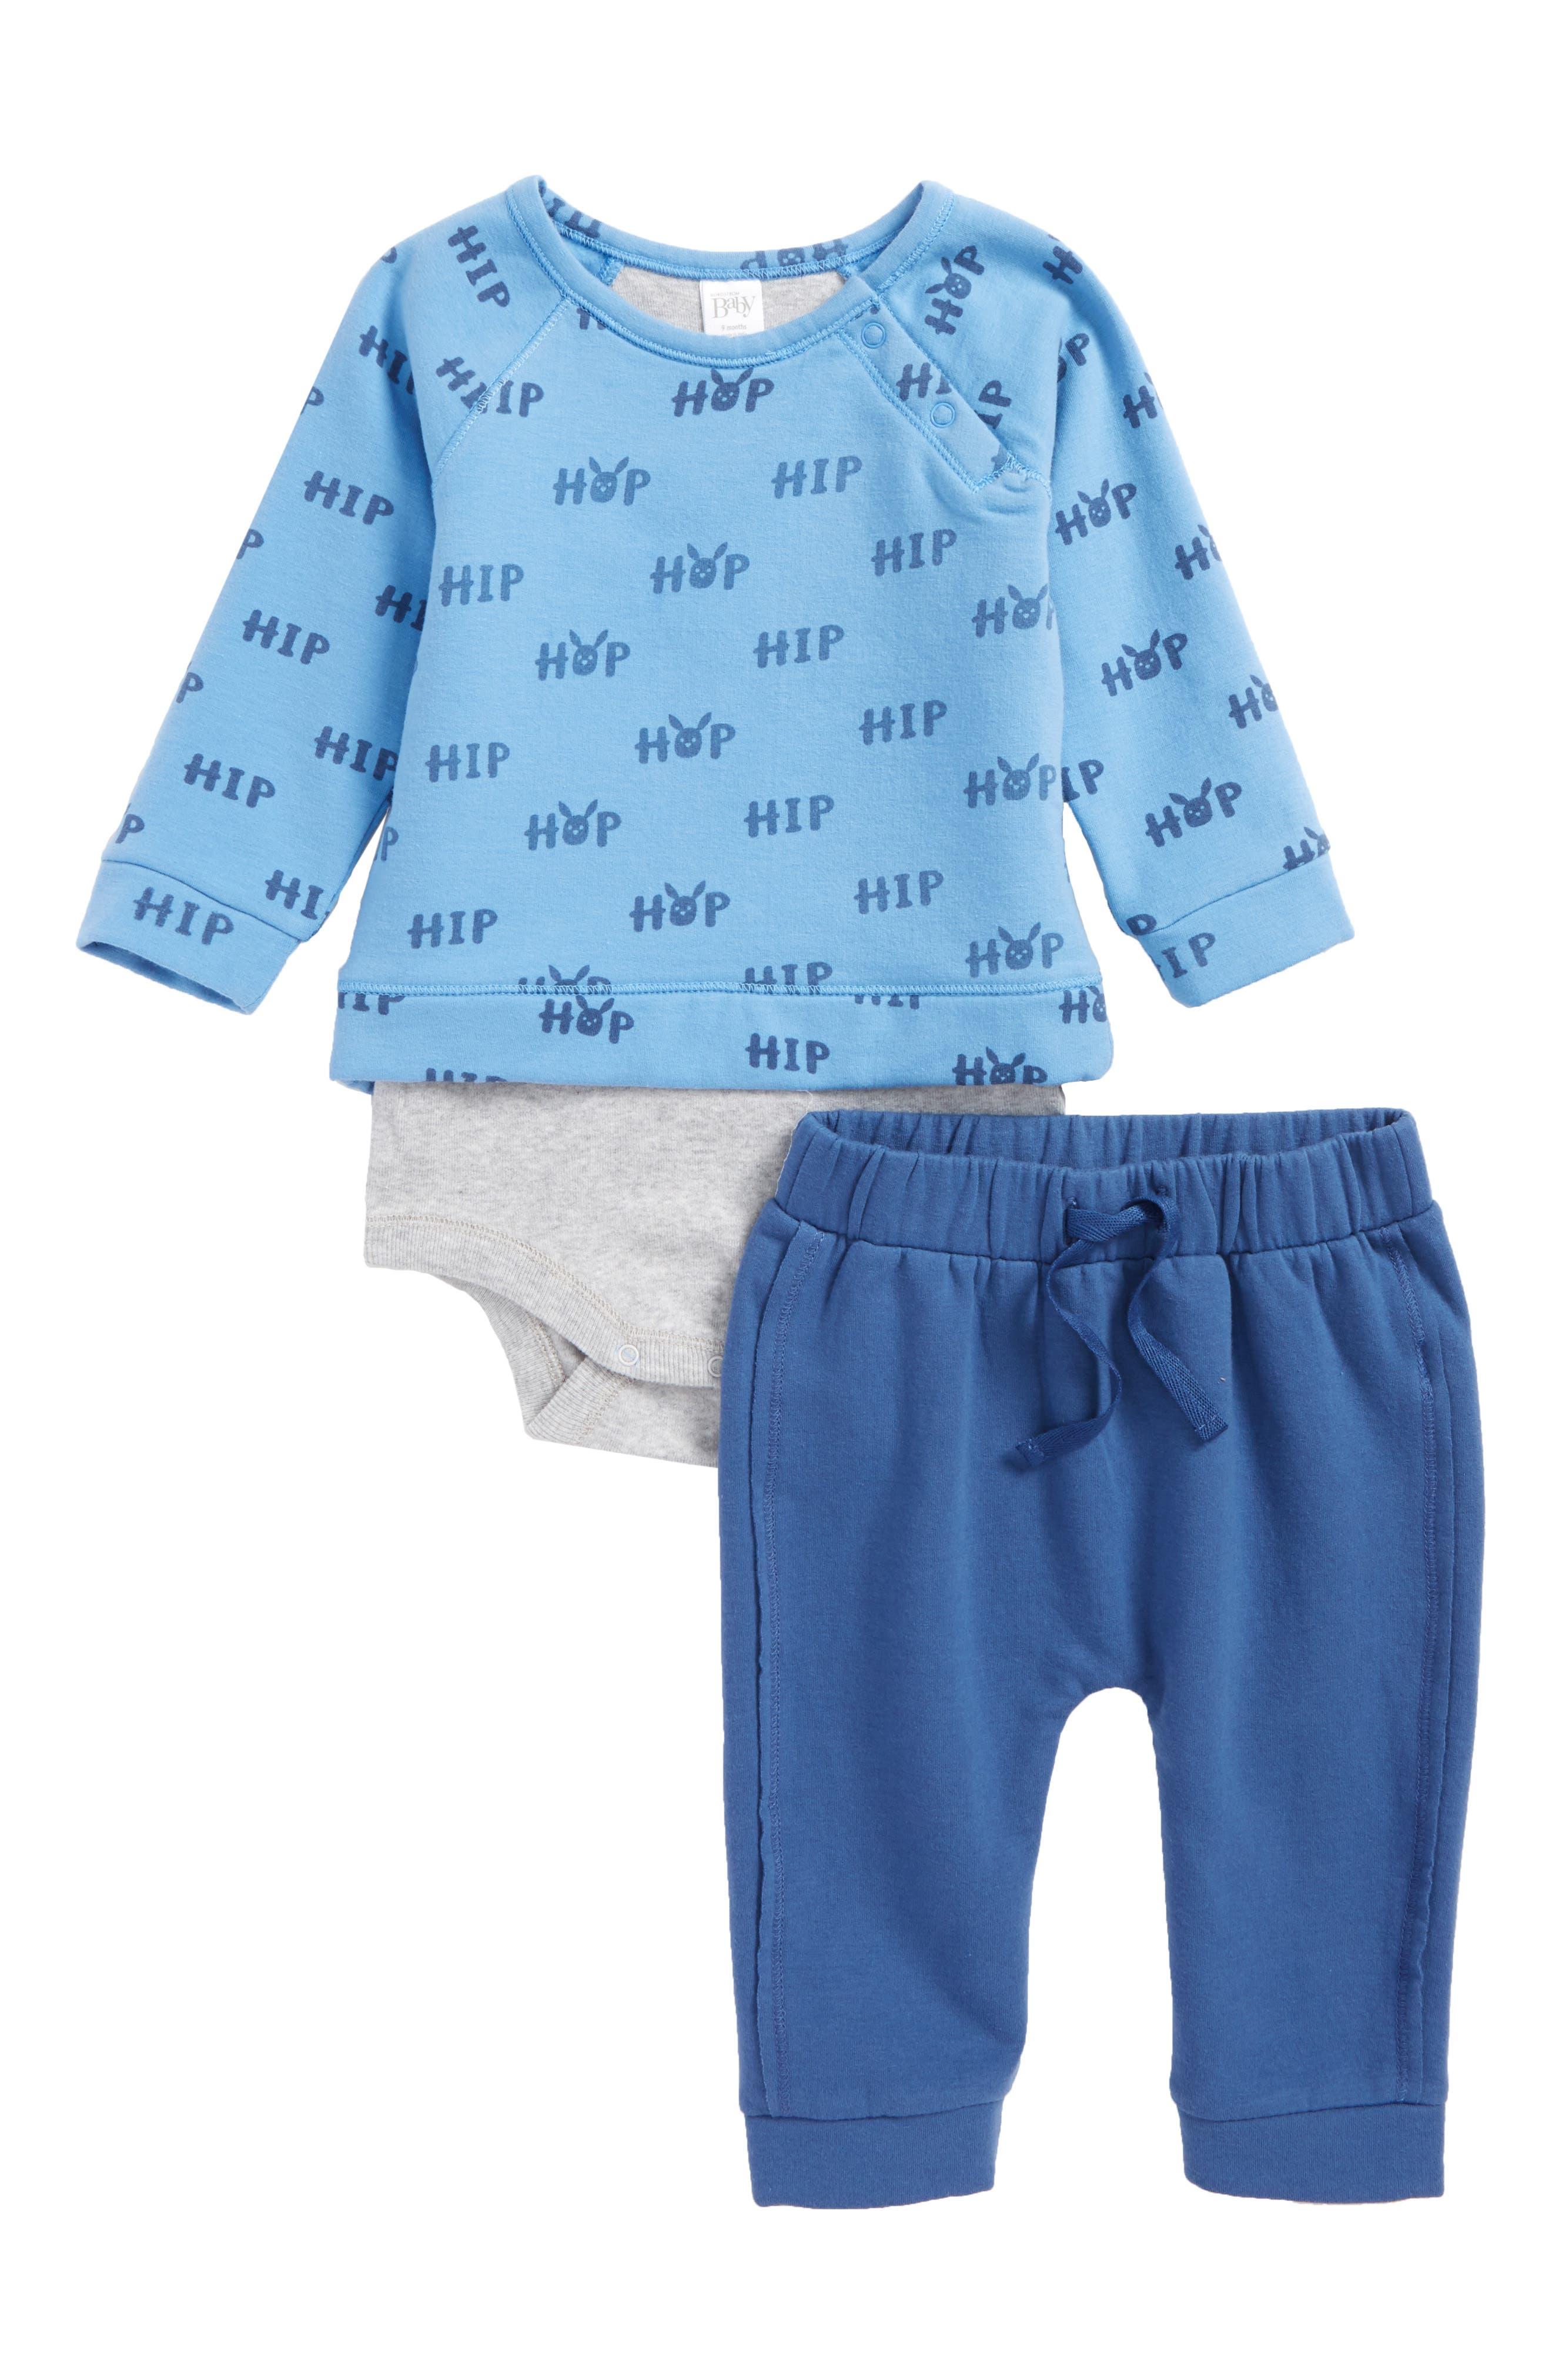 Main Image - Nordstrom Baby Bodysuit & Sweatpants Set (Baby Boys)